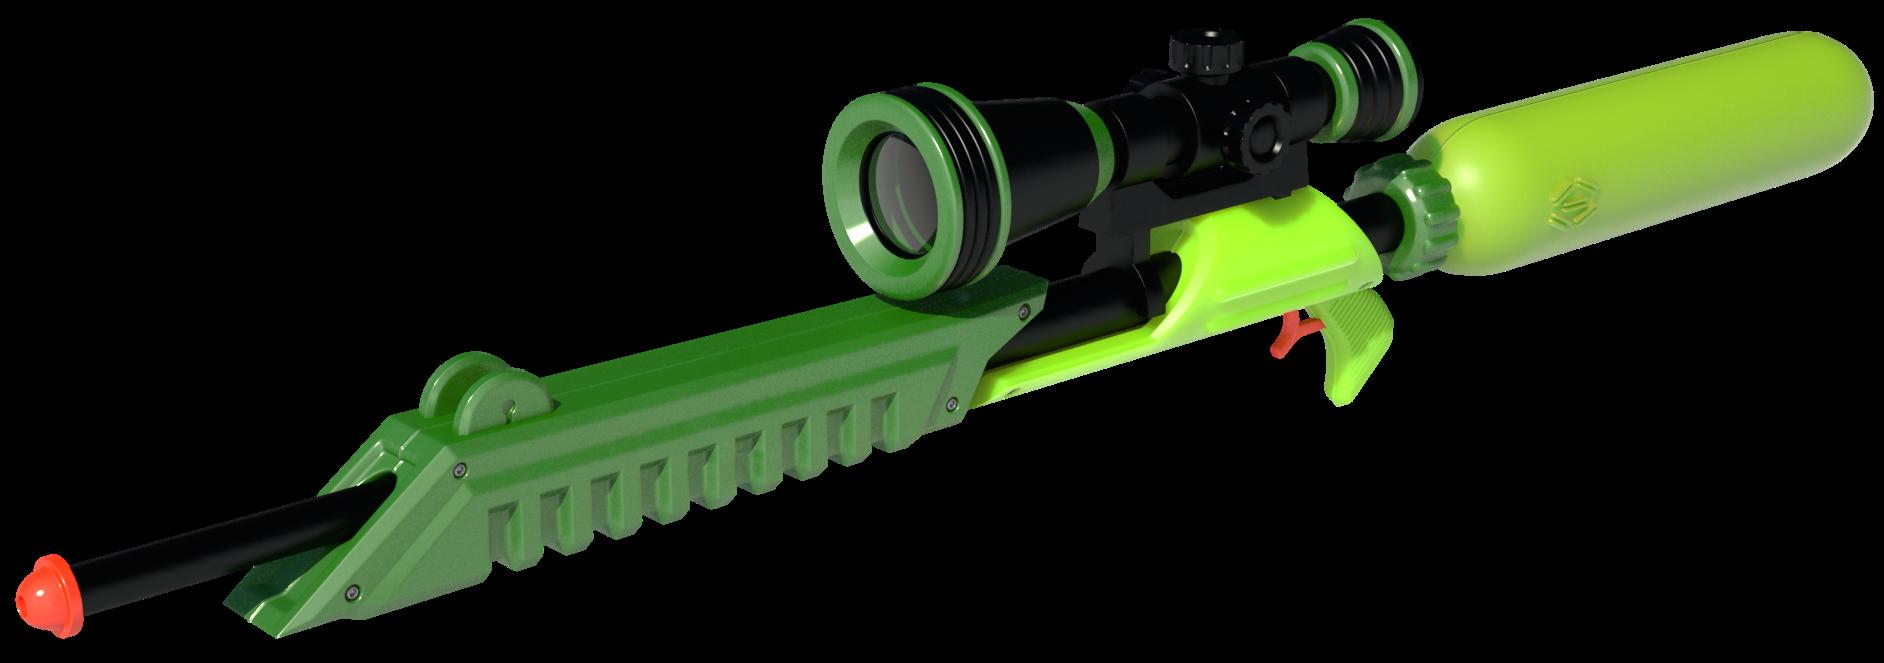 clipart transparent library splatoon transparent sniper #103562204